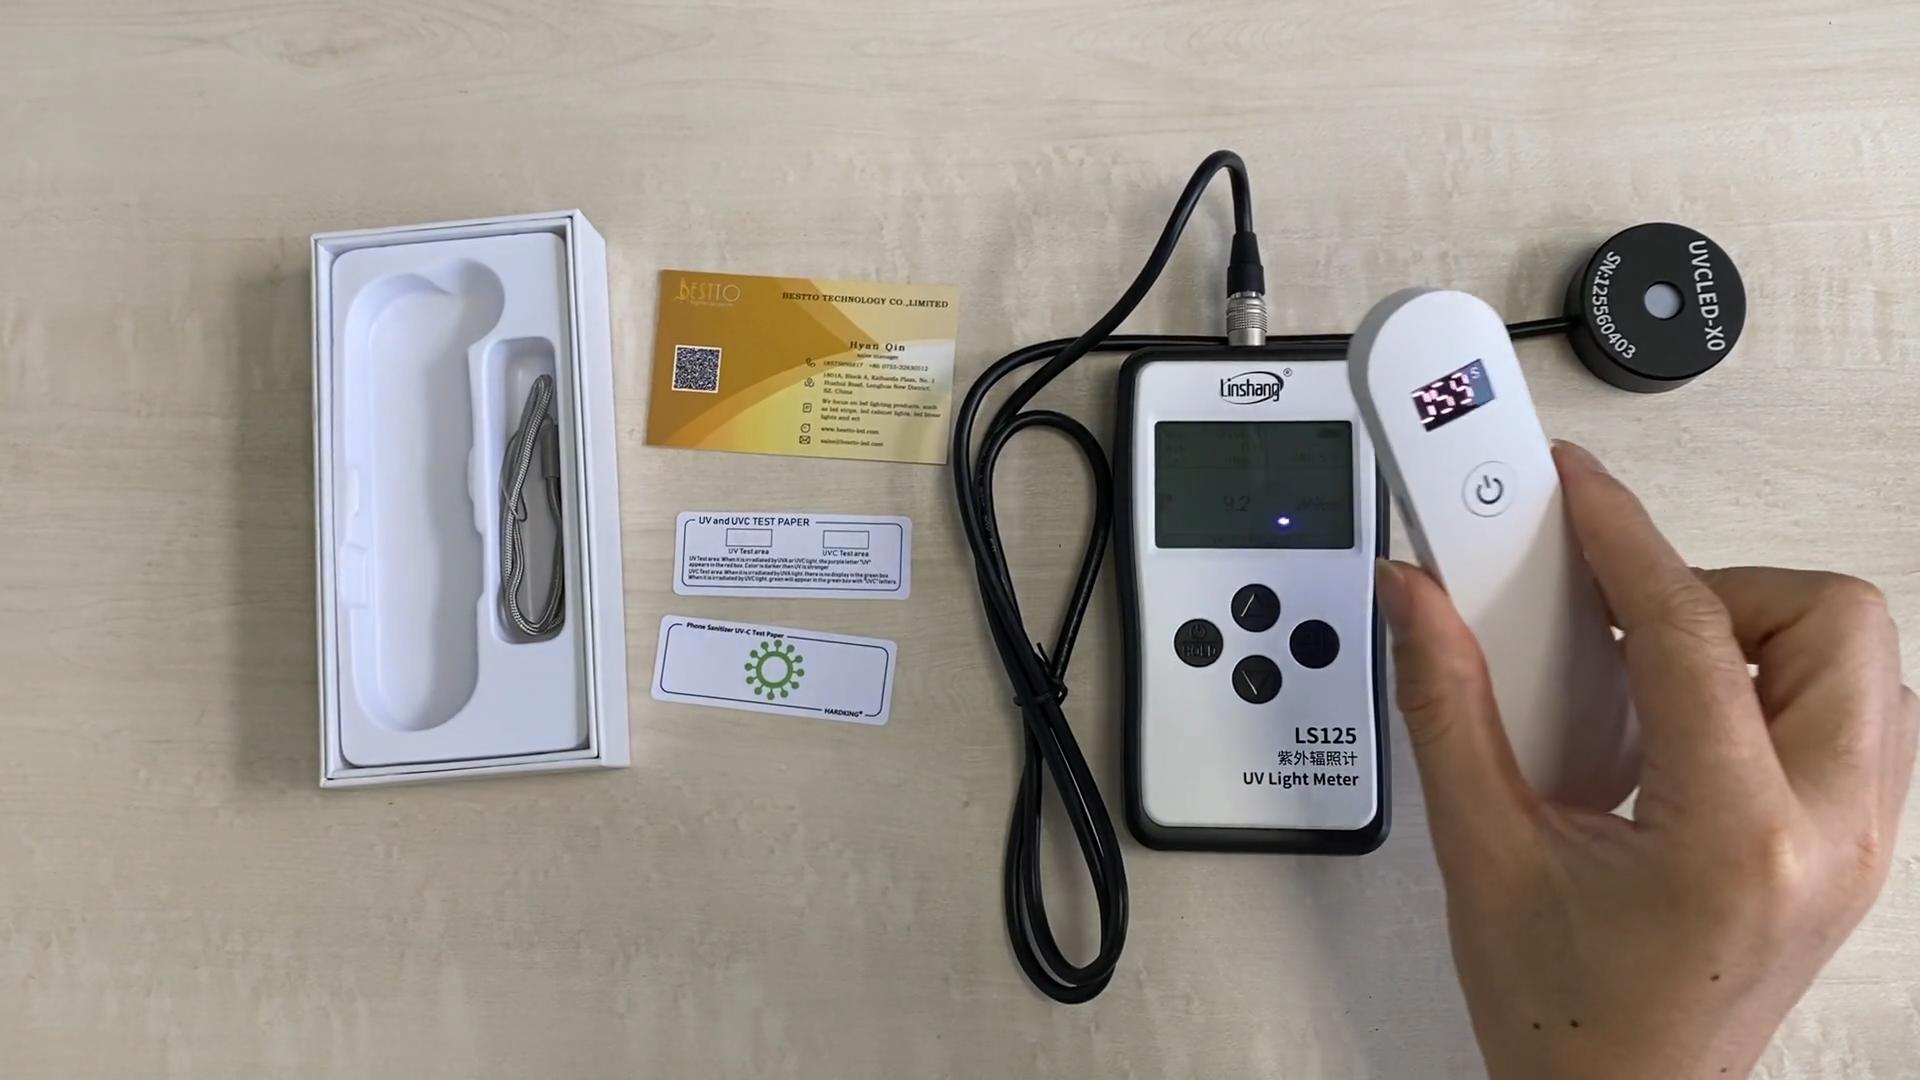 2W Mini easy to carry portable Handheld Small 270nm Led UVC Light Lamp UV Sterilizer Wand